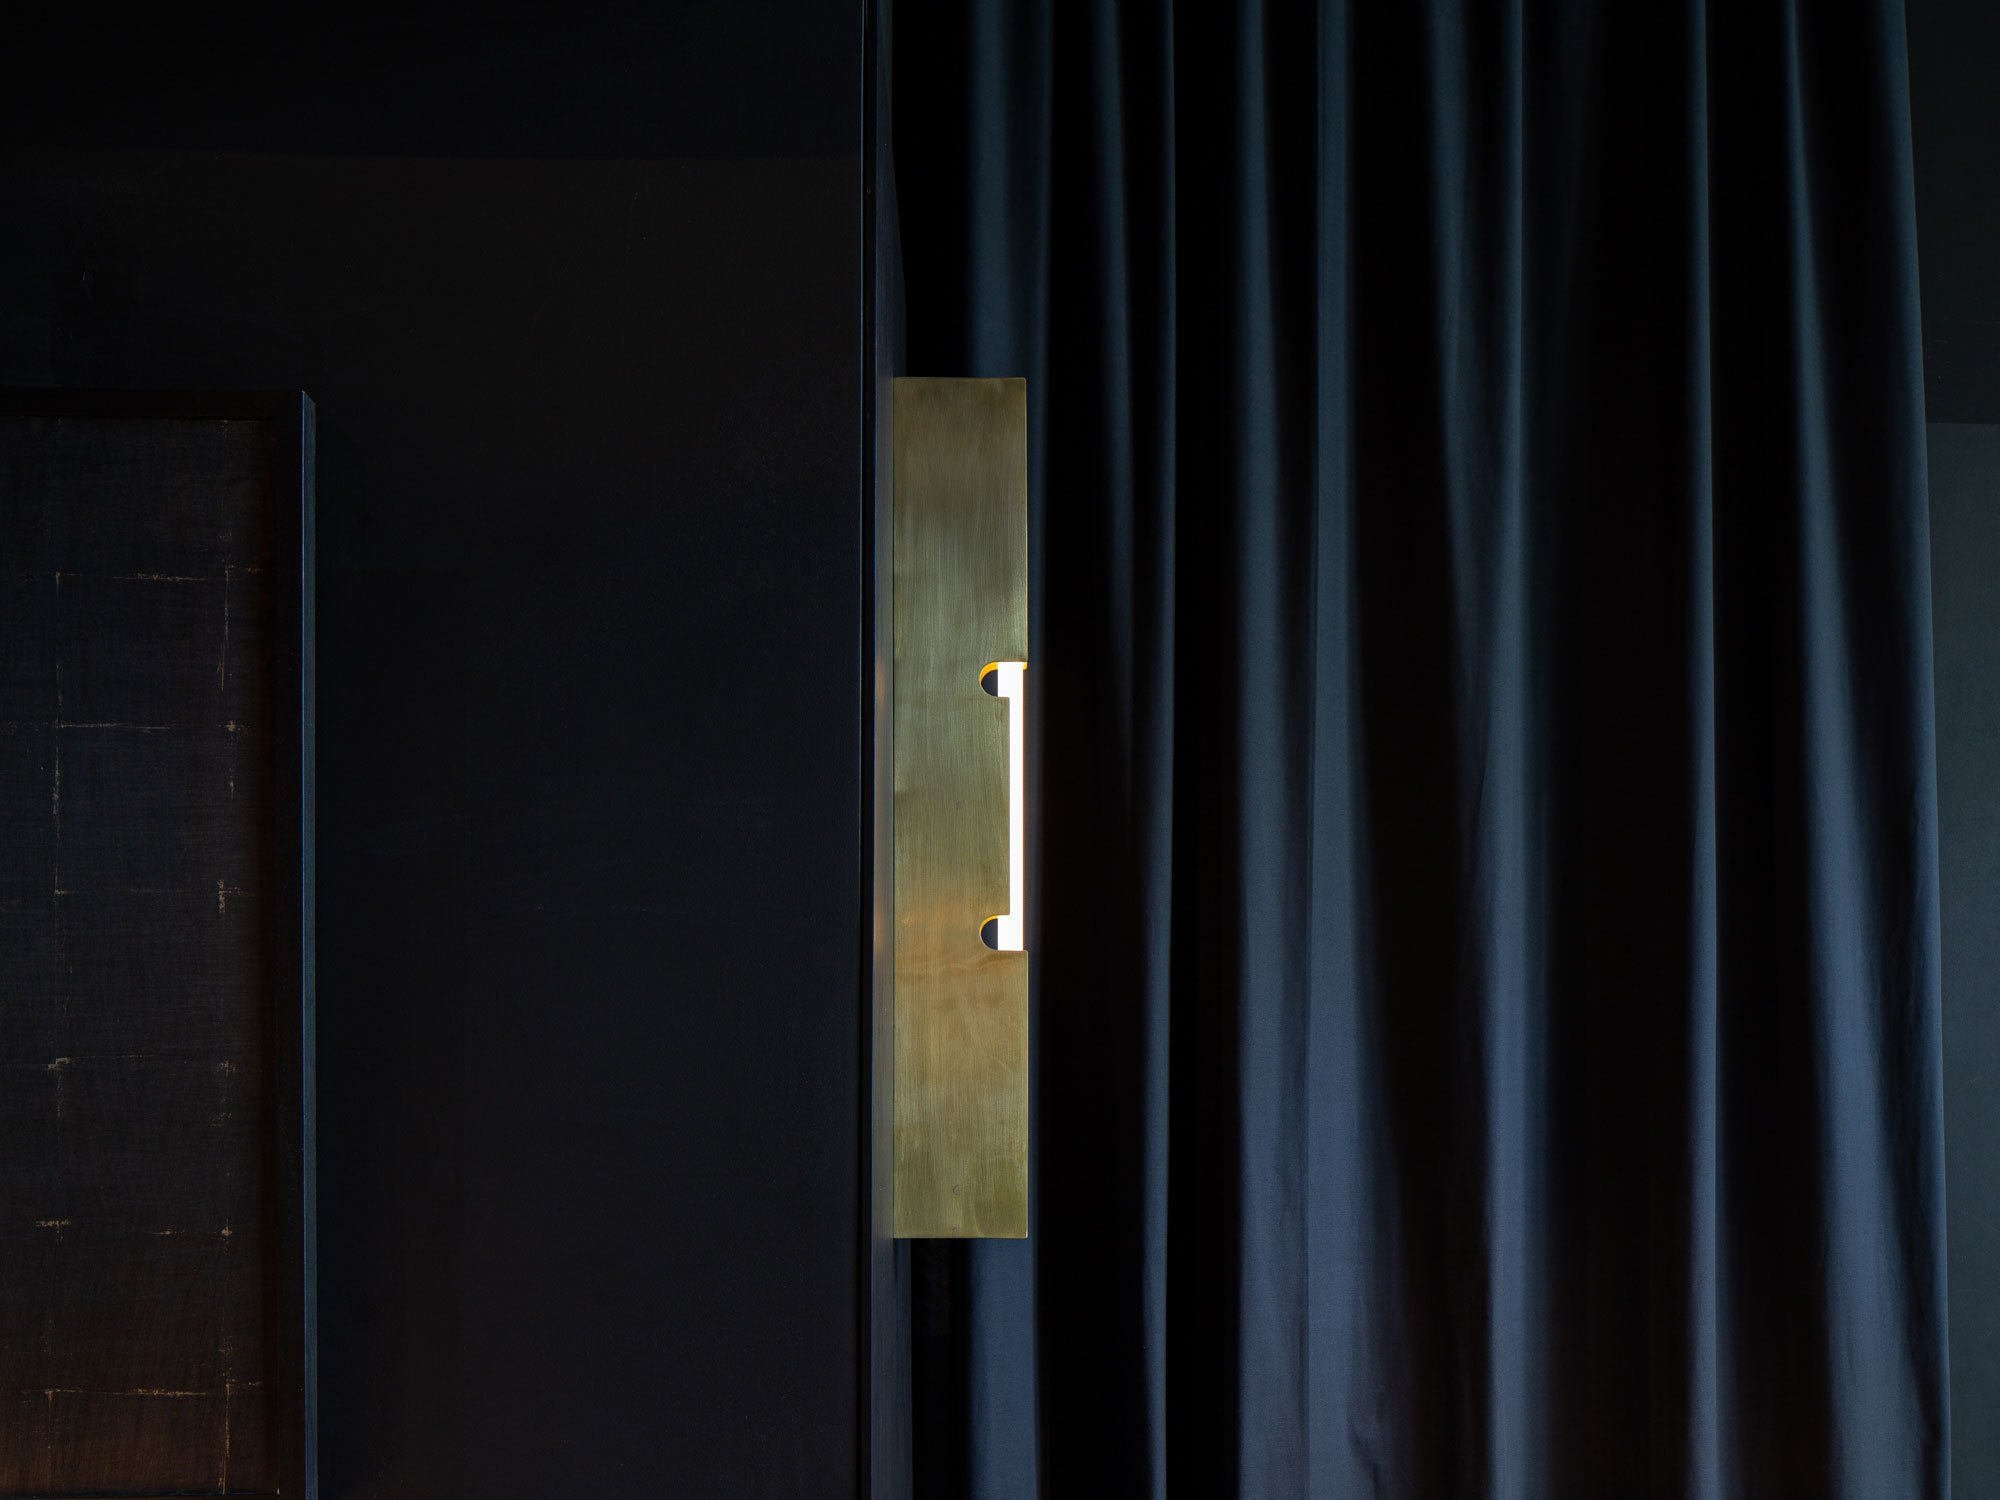 Leuchte Brass Wall, Foto: ©Pournoir